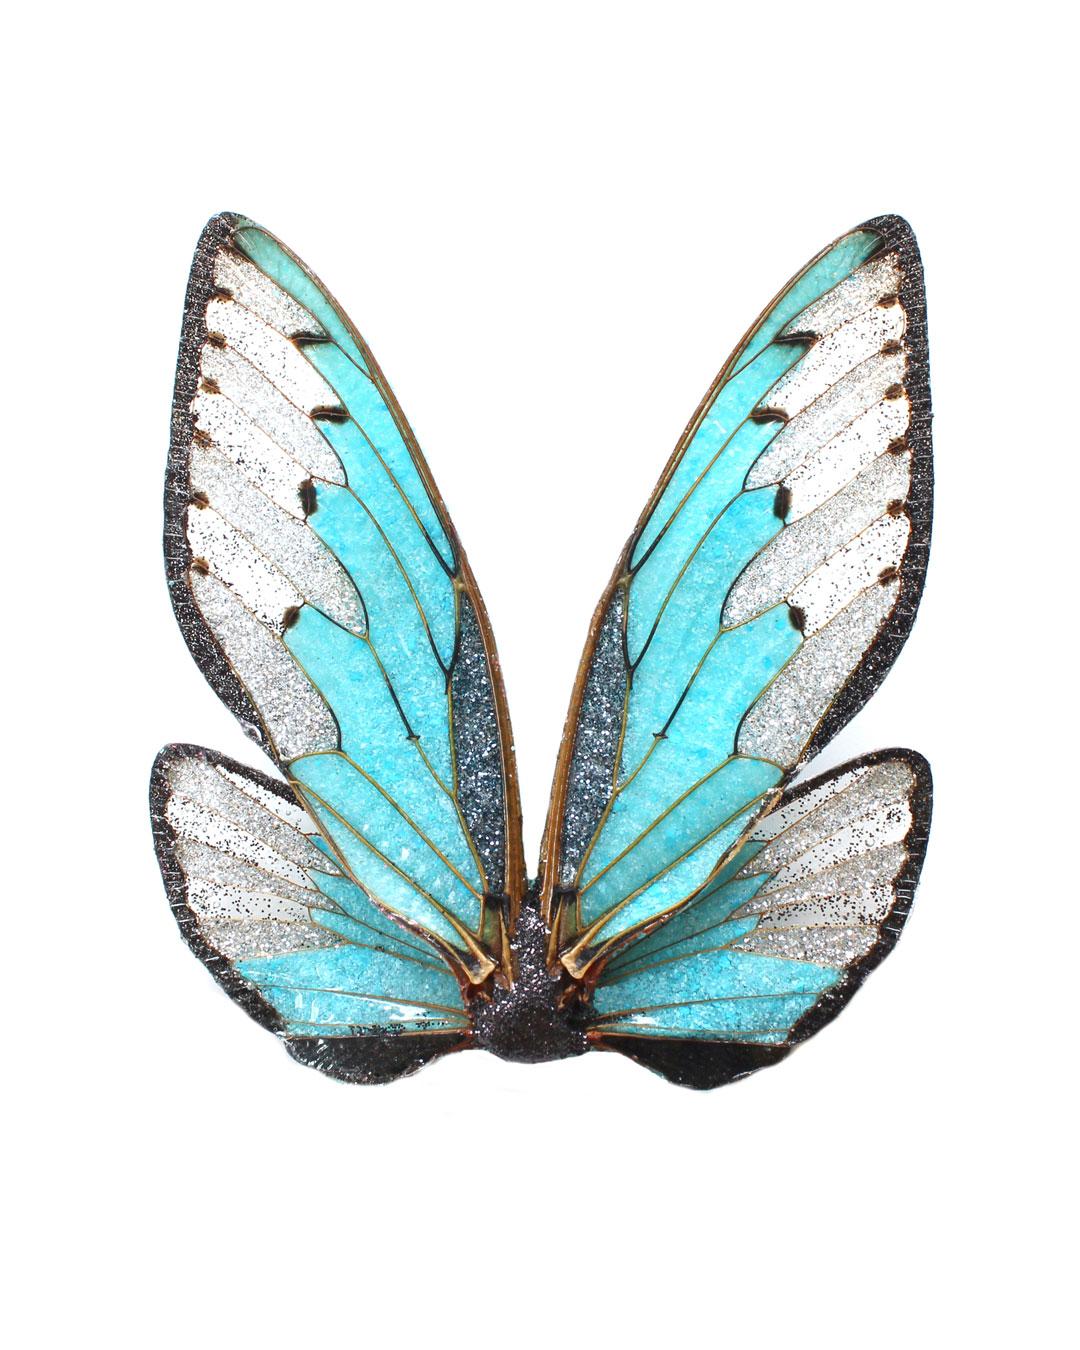 Märta Mattsson, Wings, 2016, brooch; cicada, resin, pigment, silver, 100 x 80 x 20 mm, €970